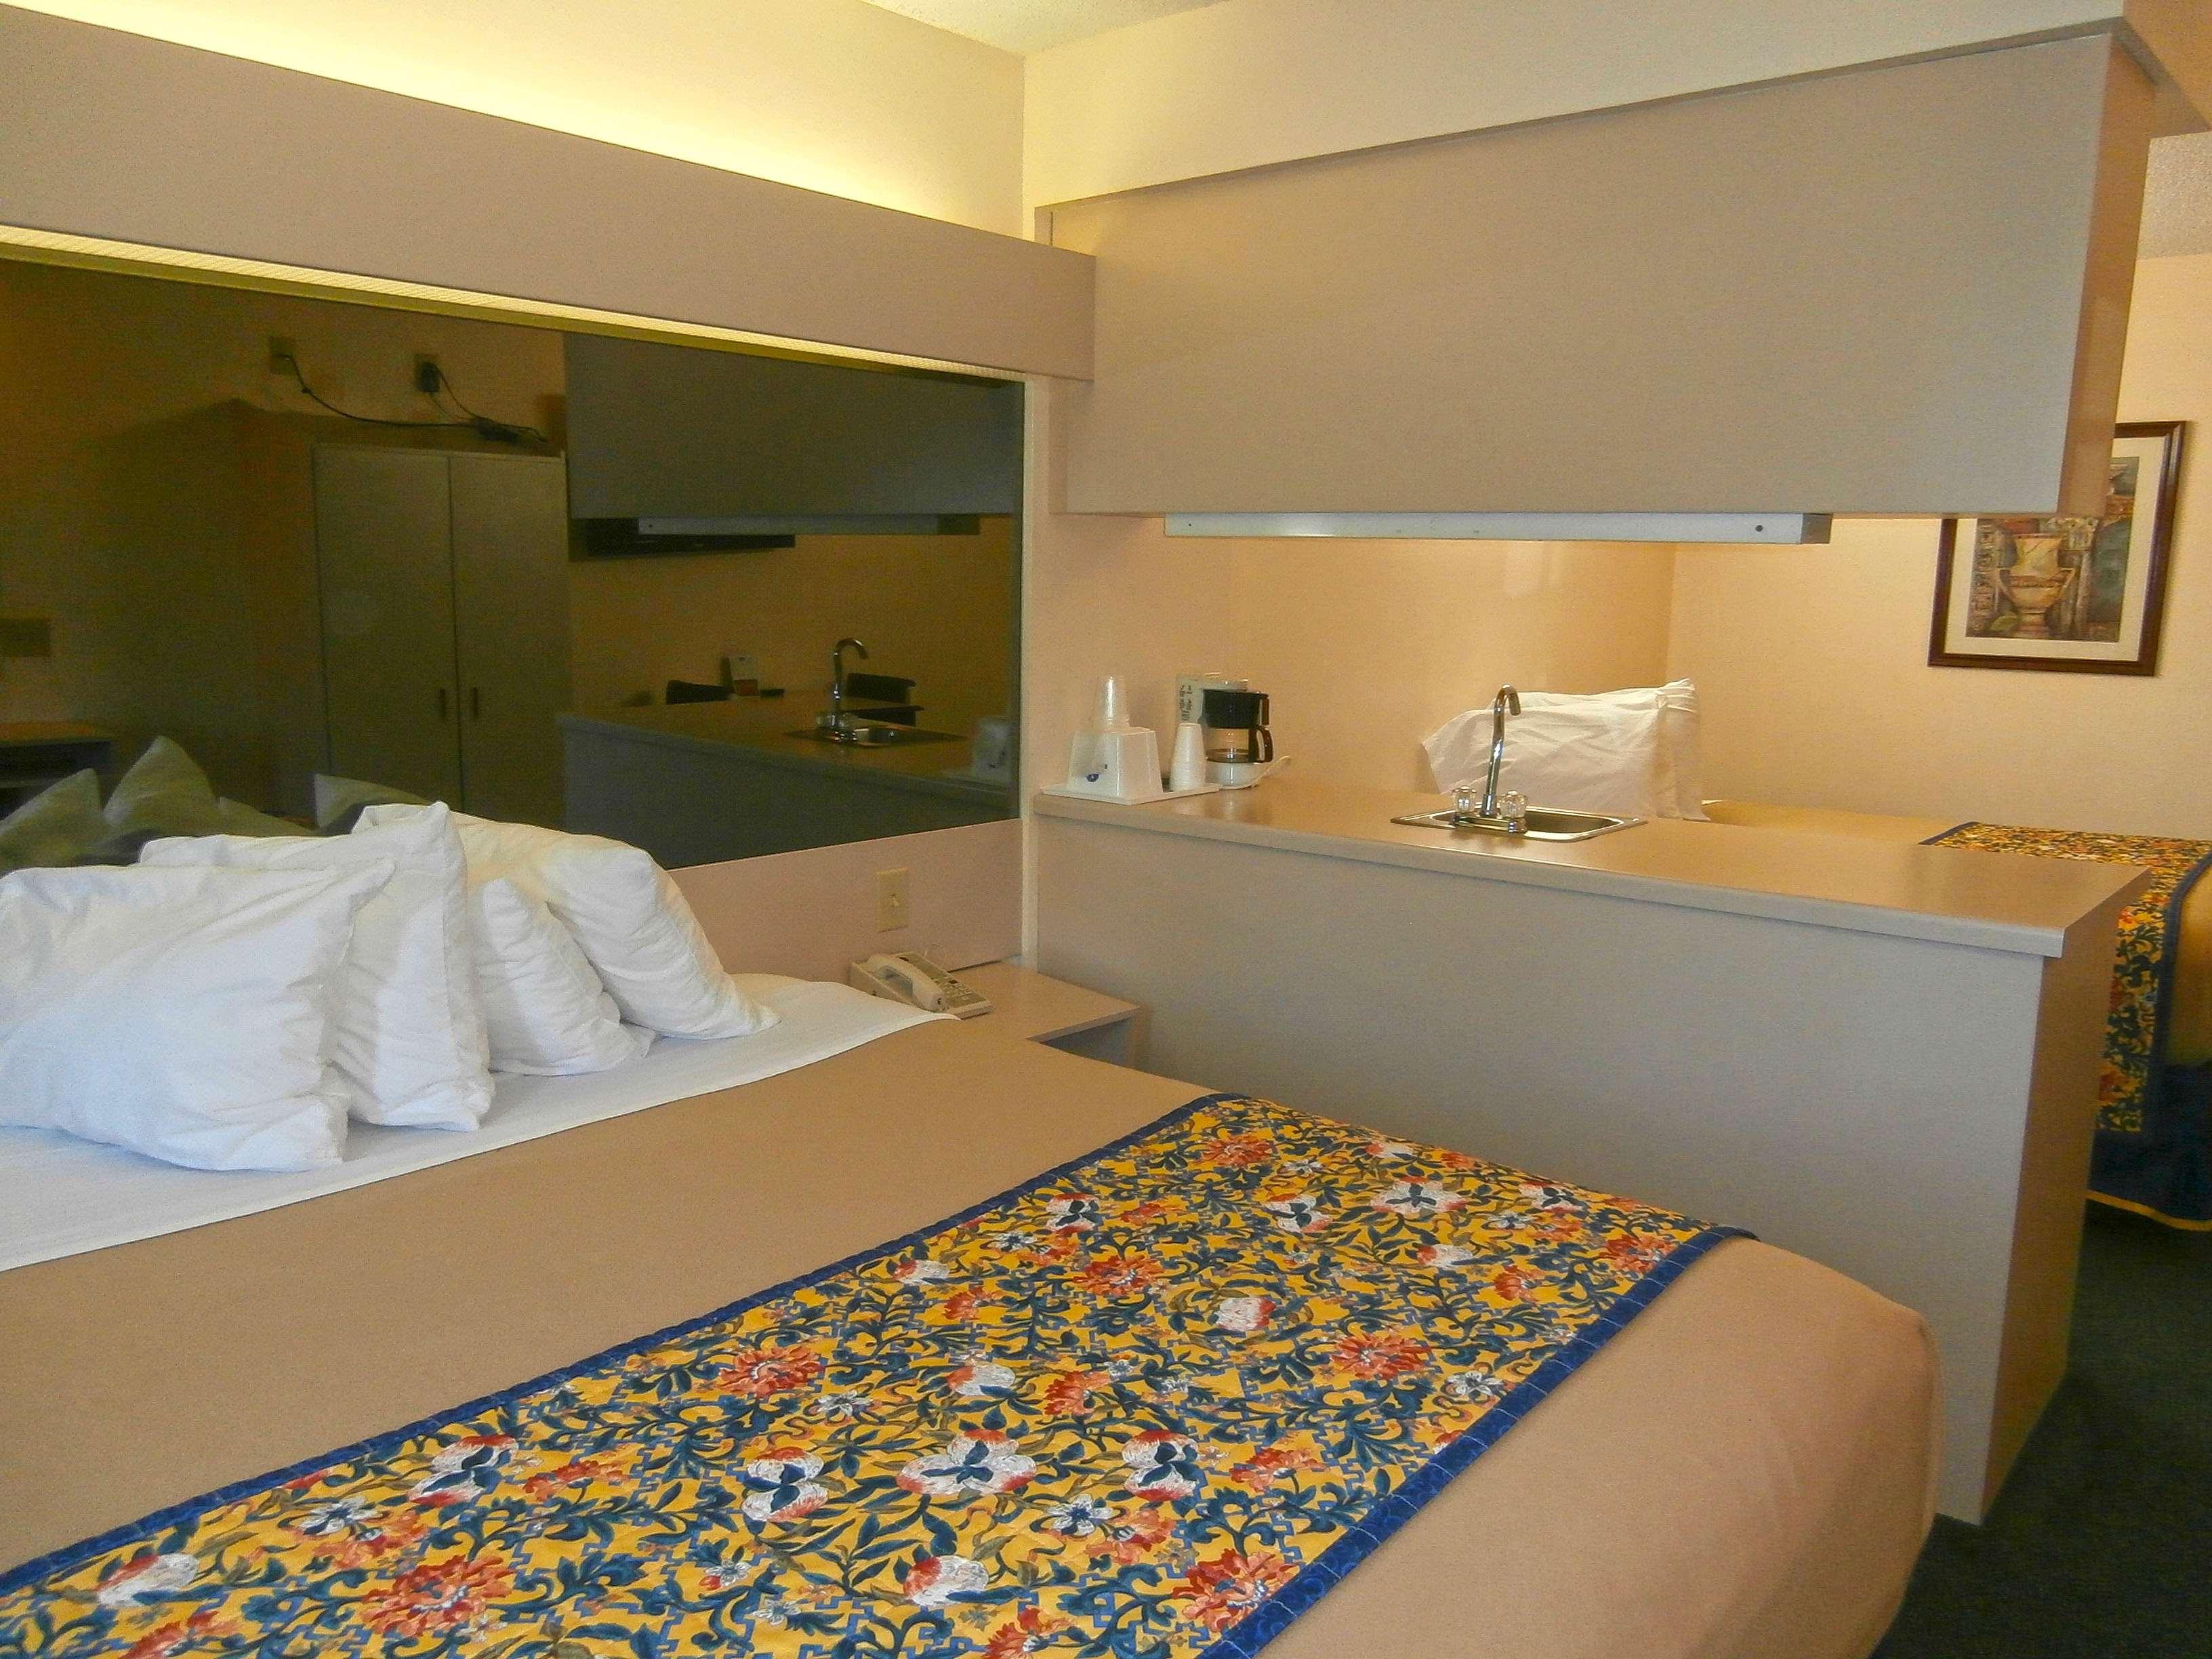 Americas Best Value Inn Amp Suites Mcdonough In Mcdonough